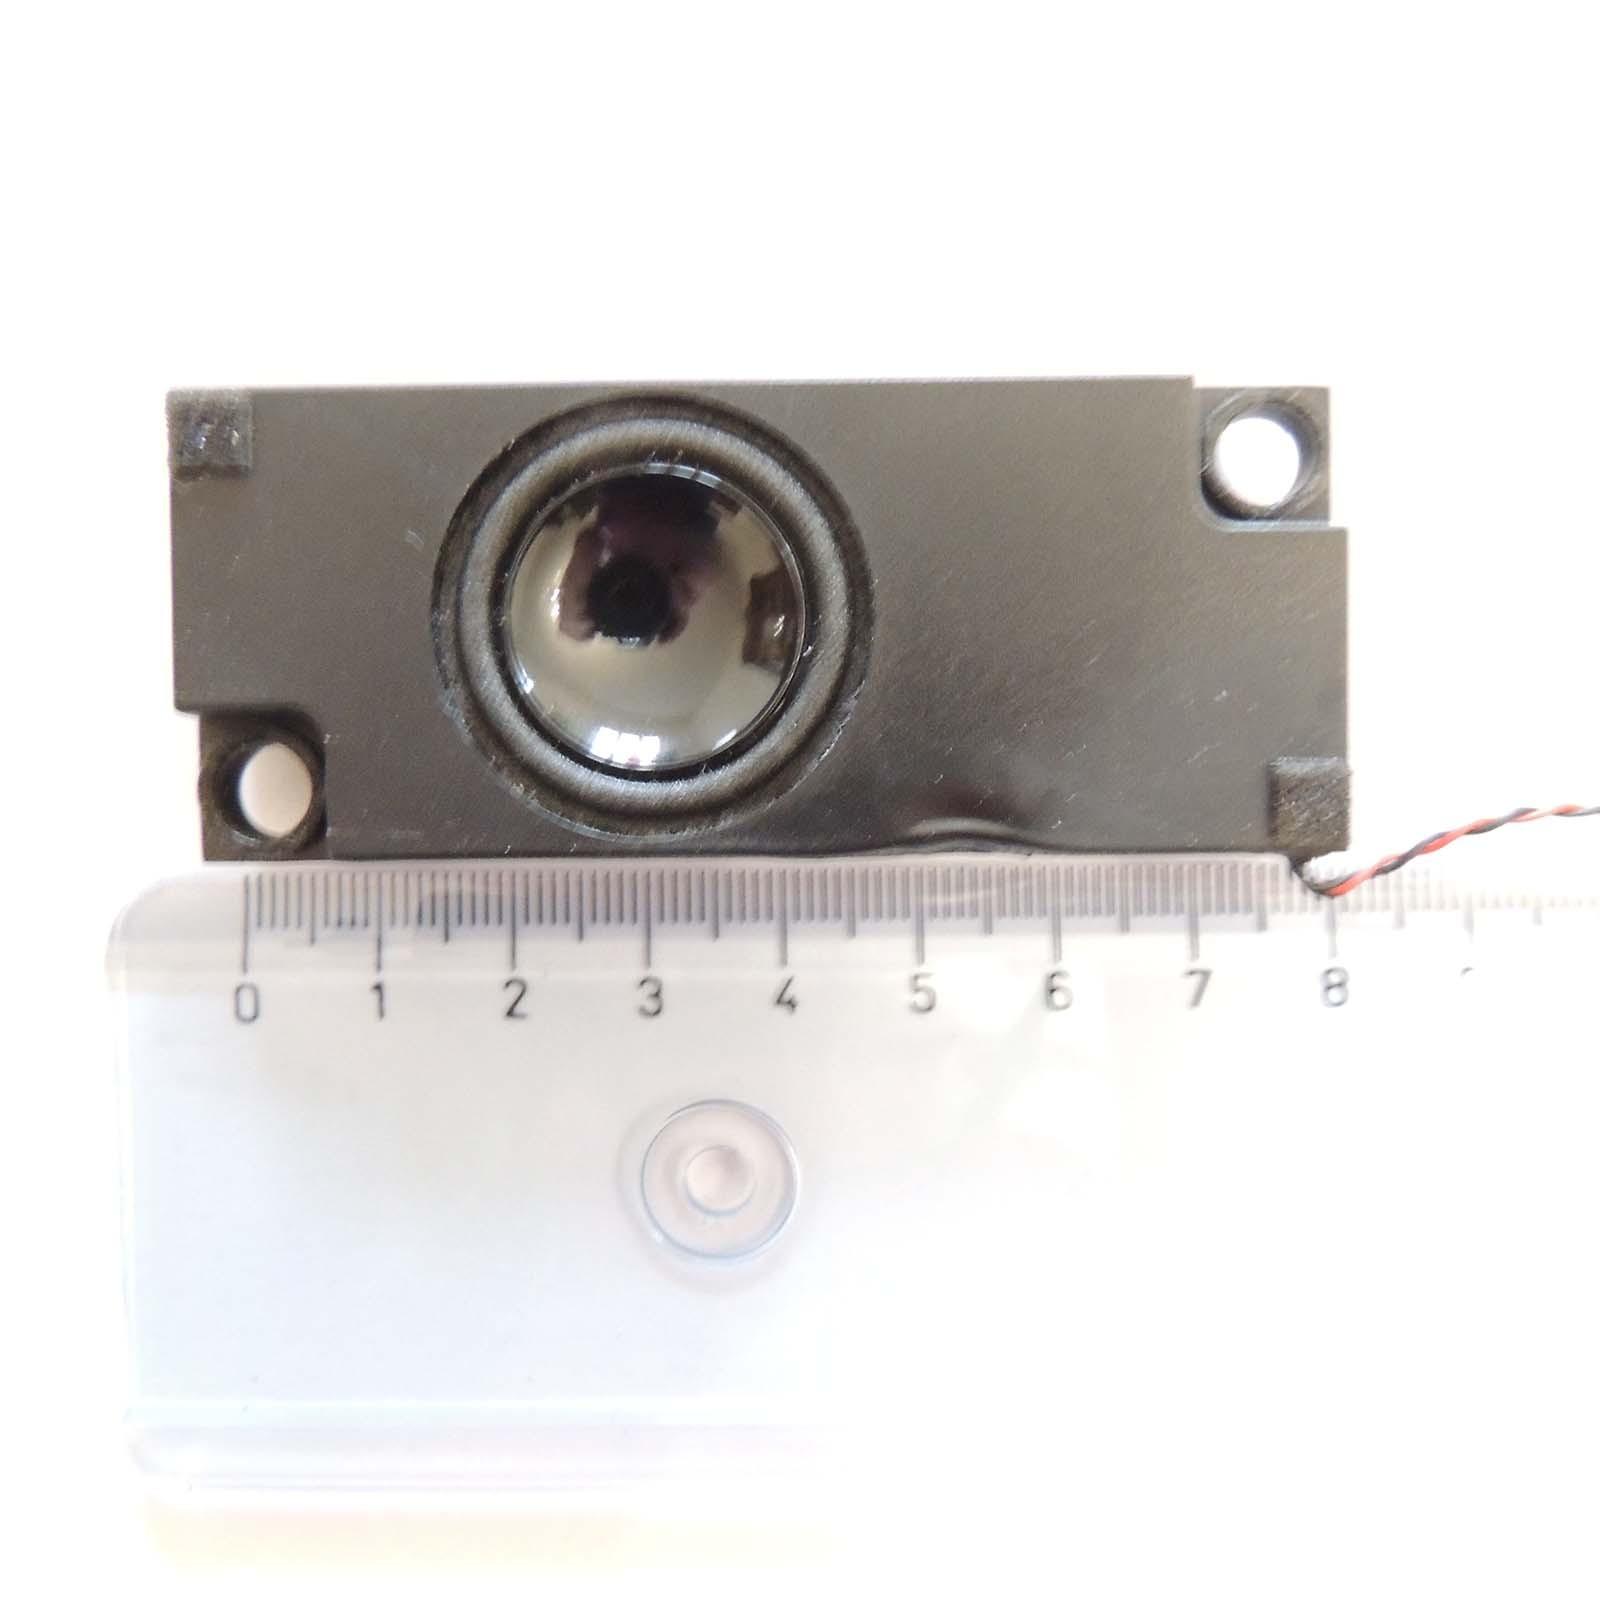 Speaker Amilo XA2558 fujitsu siemens hibox abs gg01 0726 casse audio